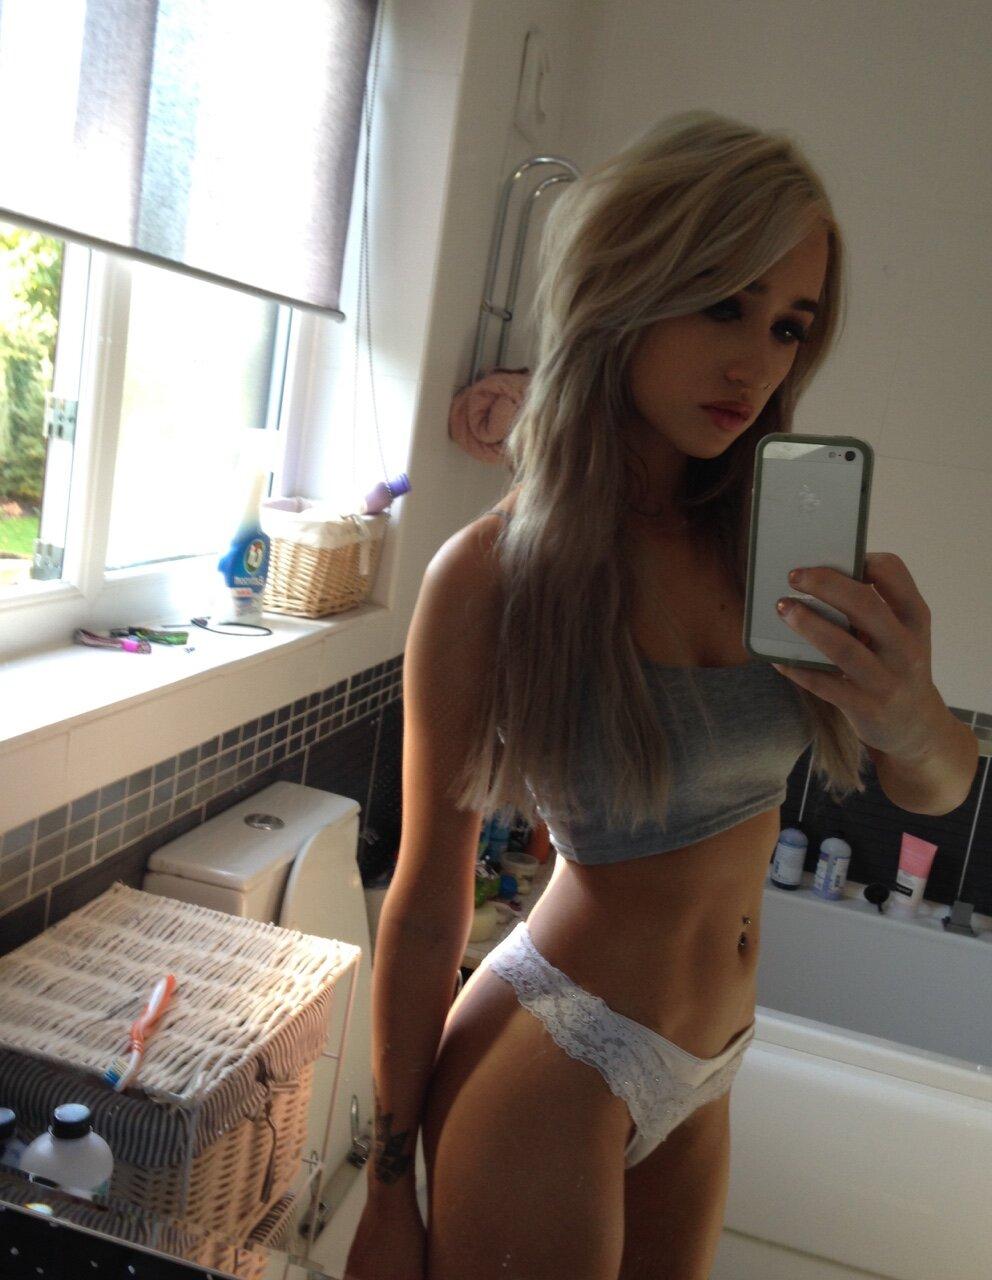 young-teen-self-pix-peek-a-boo-bikini-amateur-picture